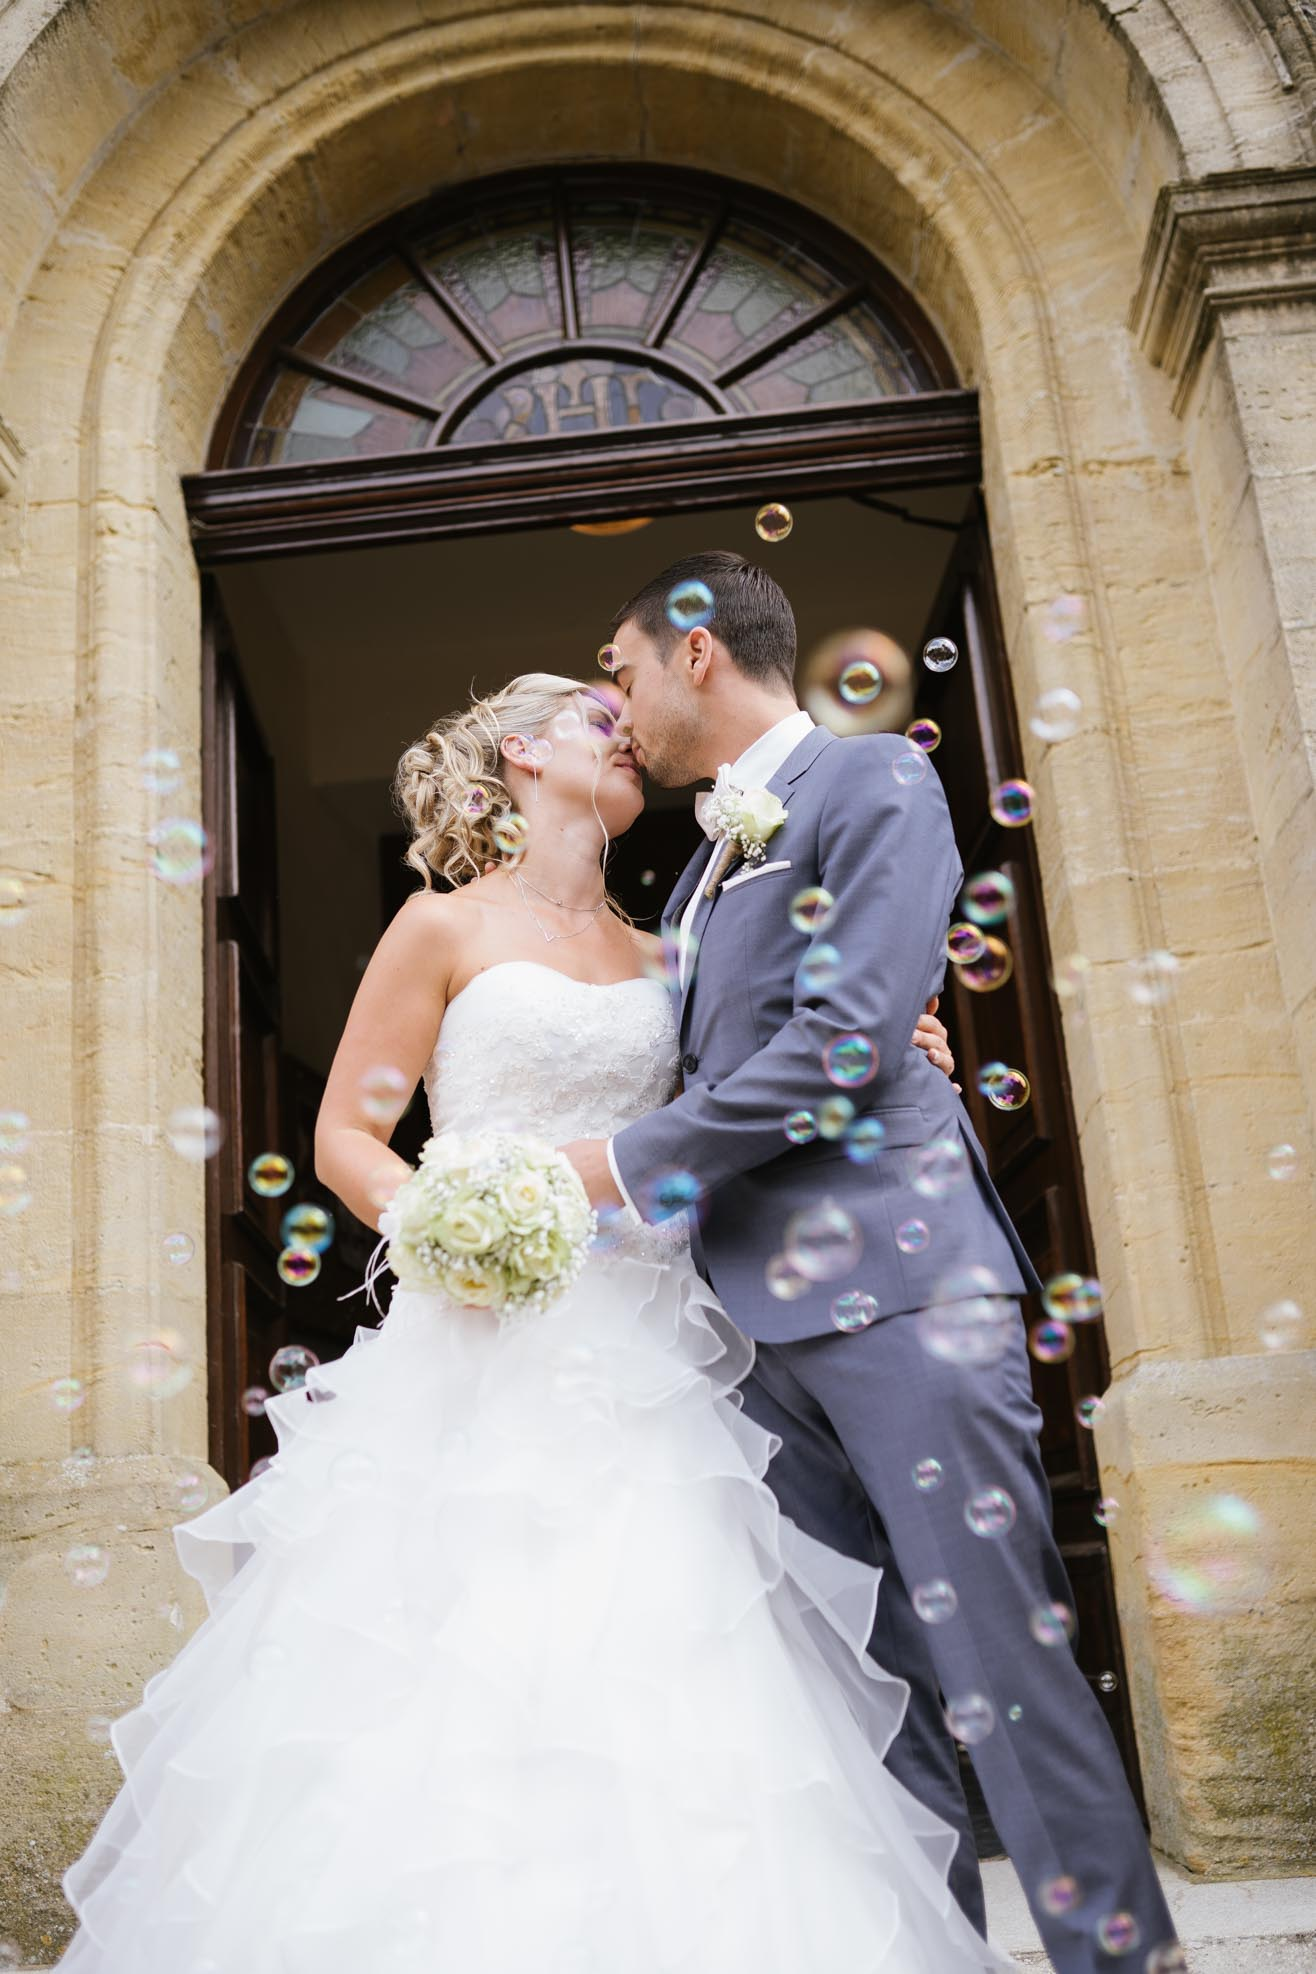 photographe-videaste-bruxelles-mariage-reportage-leleu-3.jpg